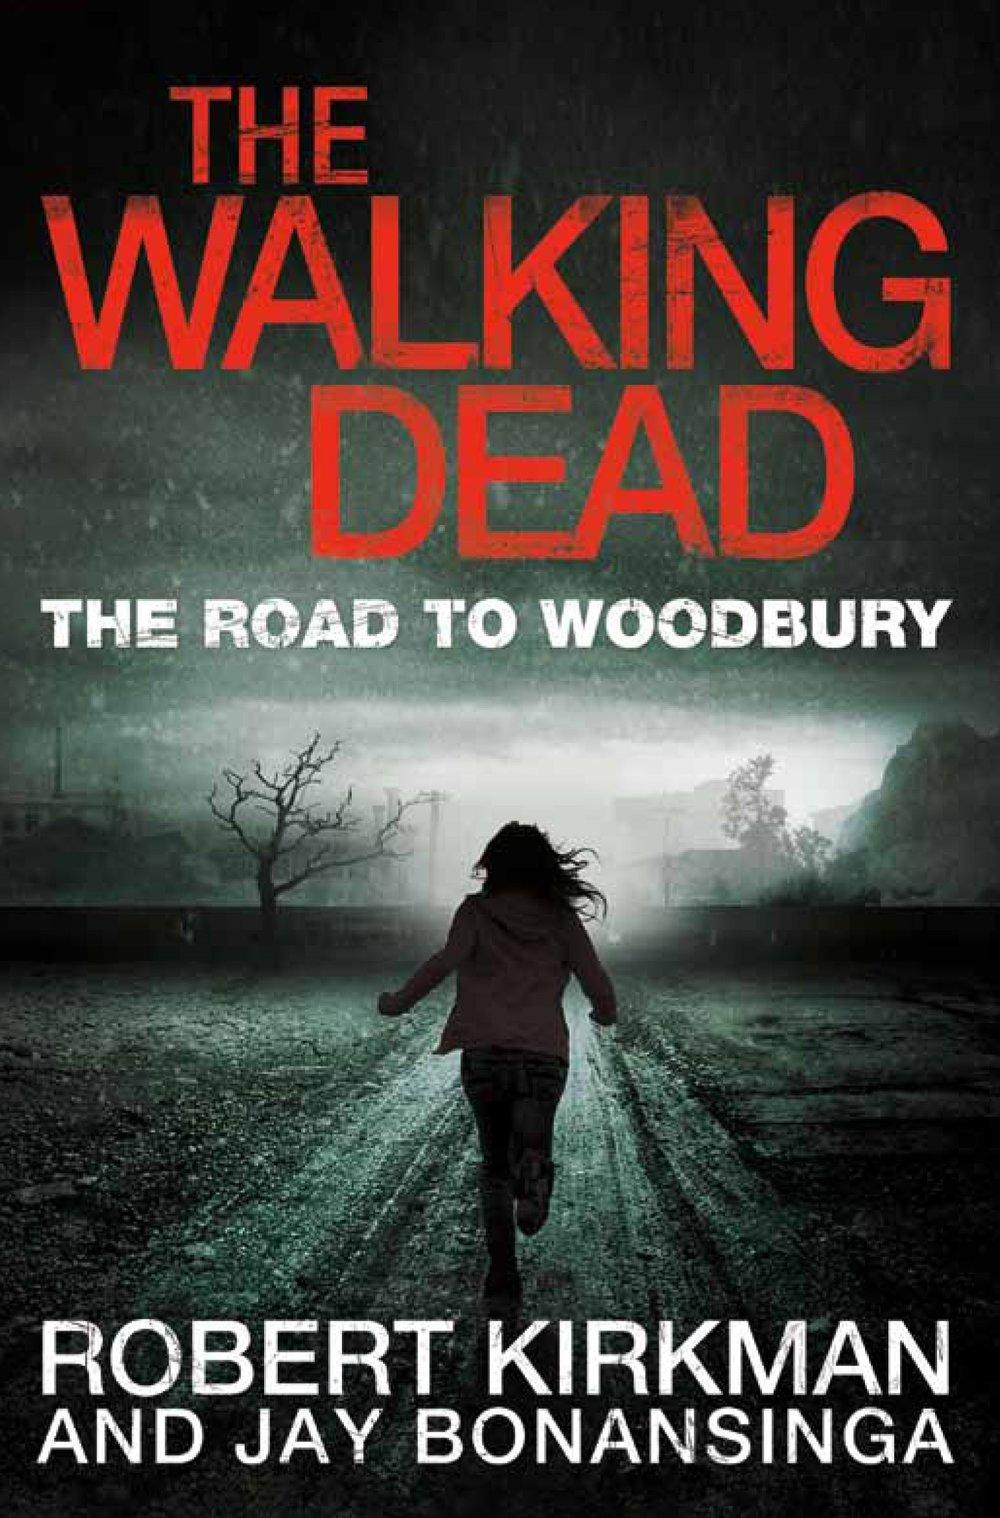 9780330541367The Walking Dead The Road to Woodbury.jpg